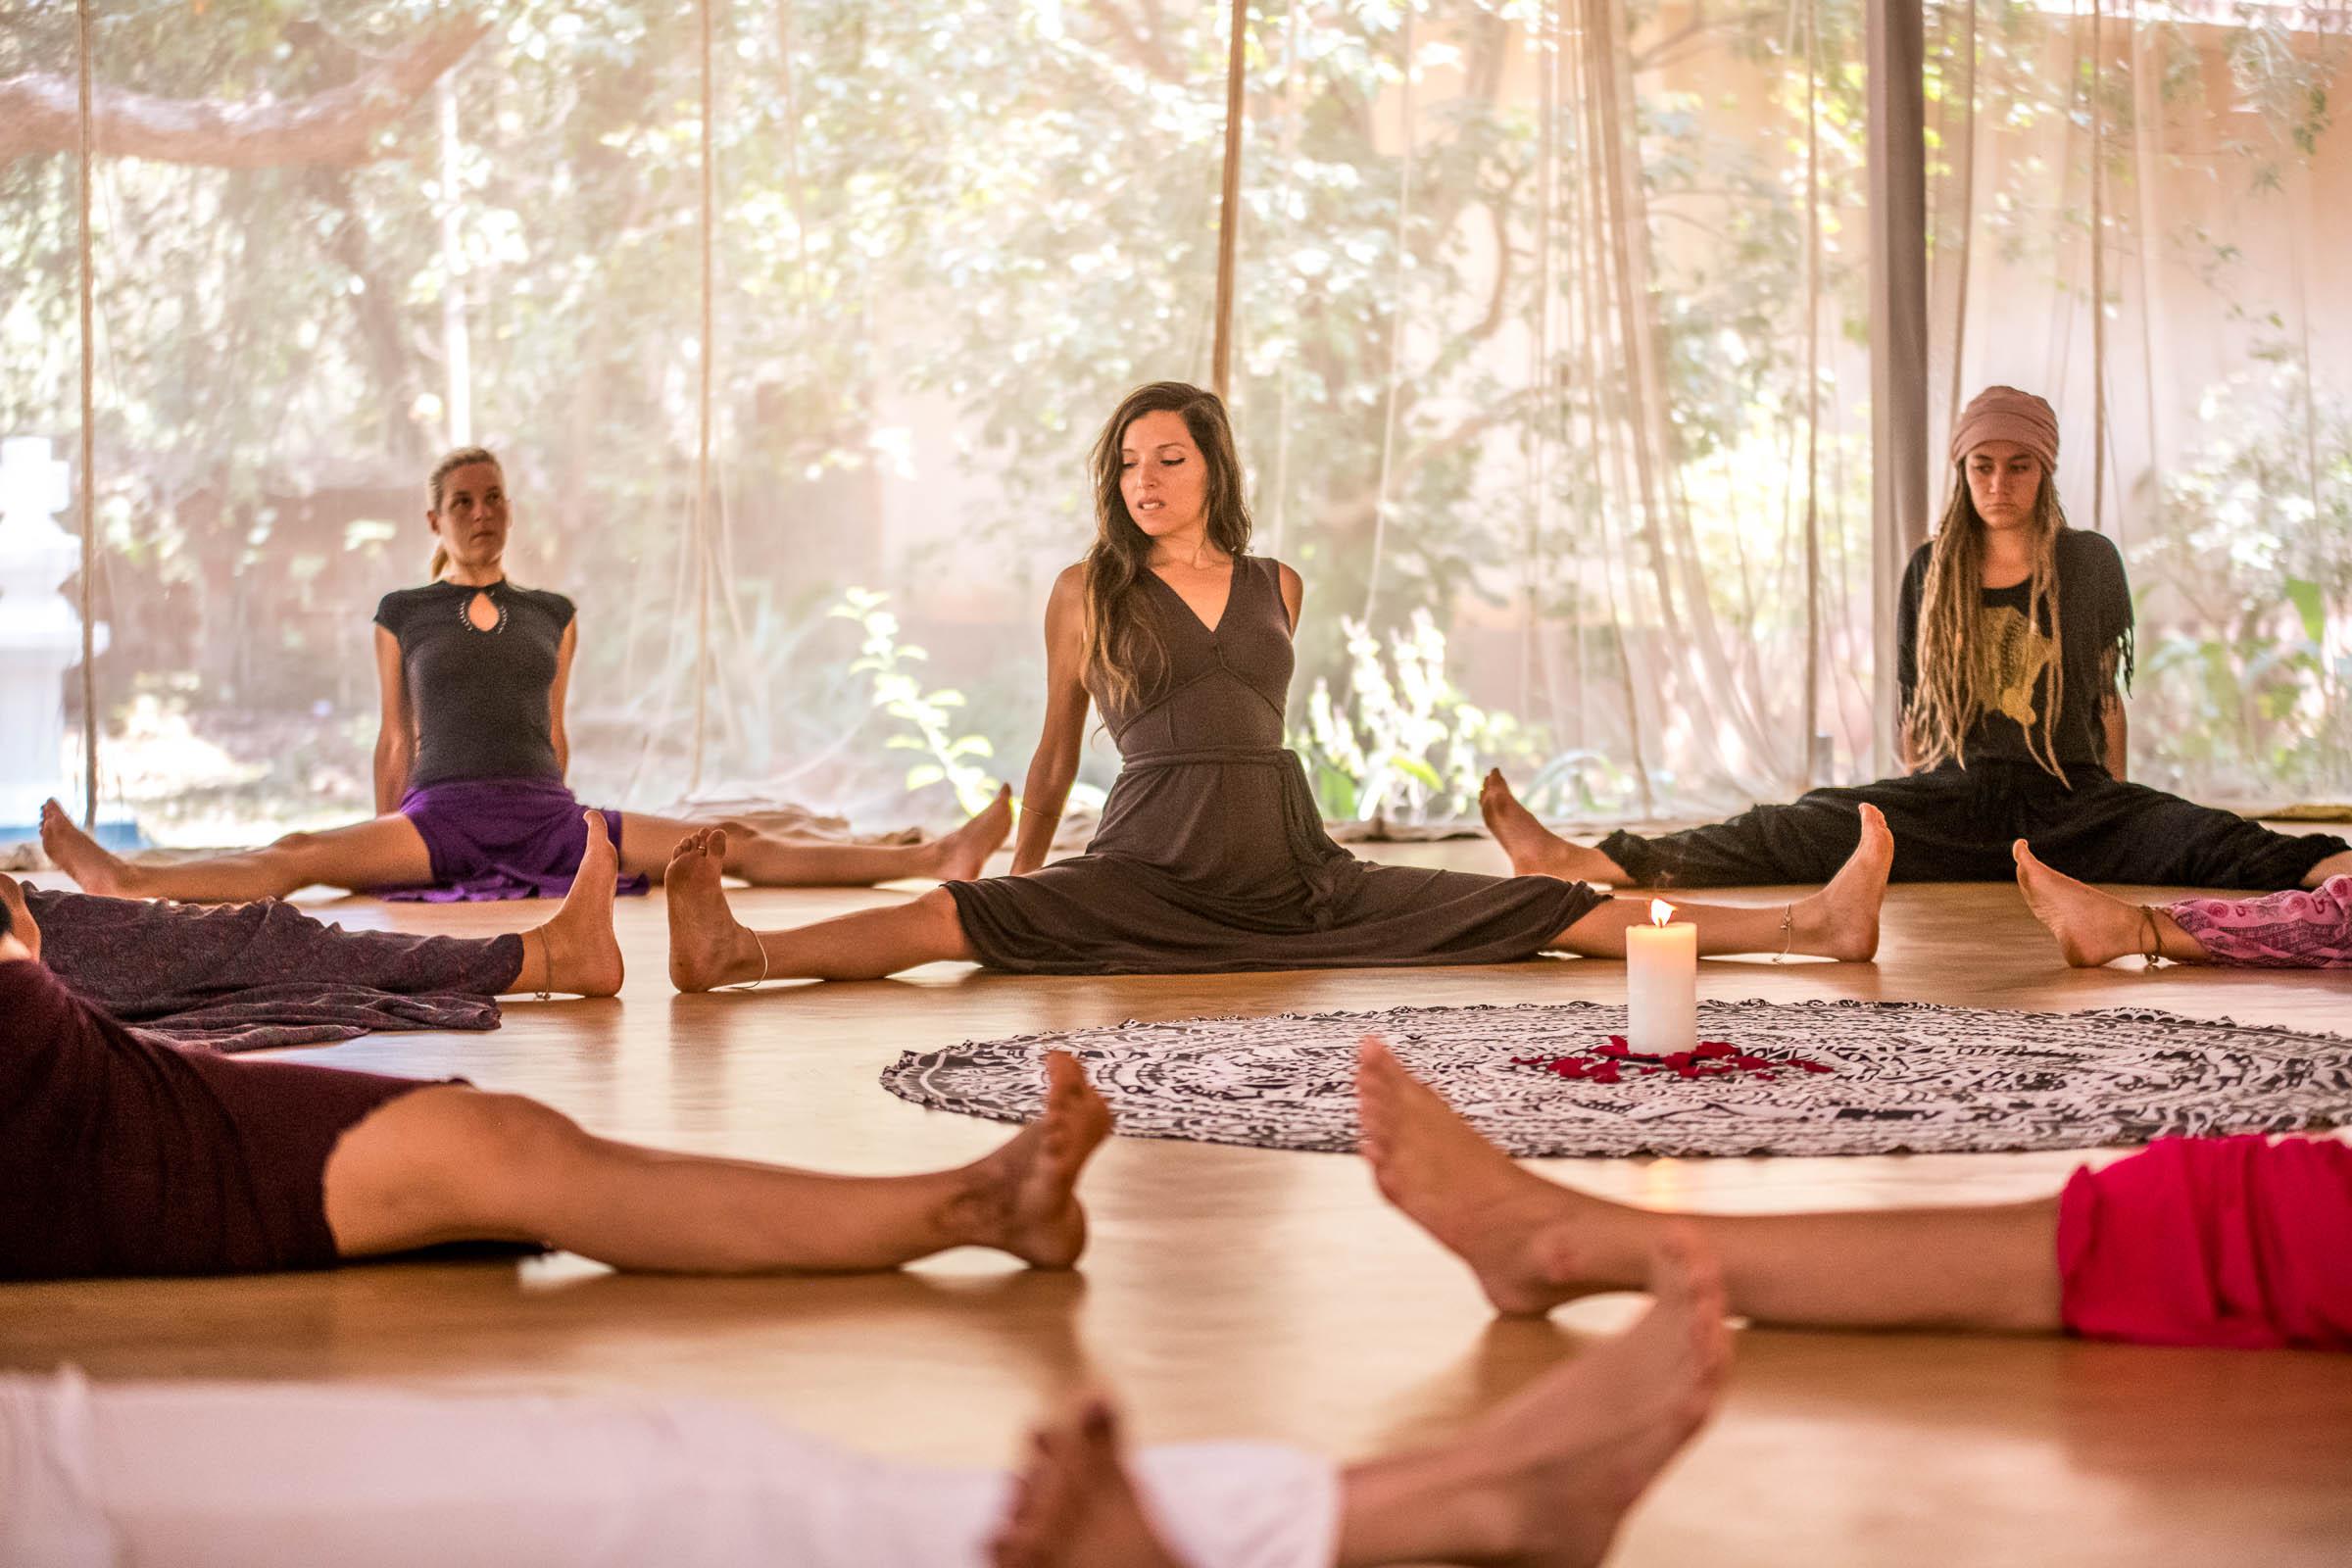 Zola Dubnikova Intense Dance Training for women only in India- Magdalena Smolarska Portrait & Retreat Photographer